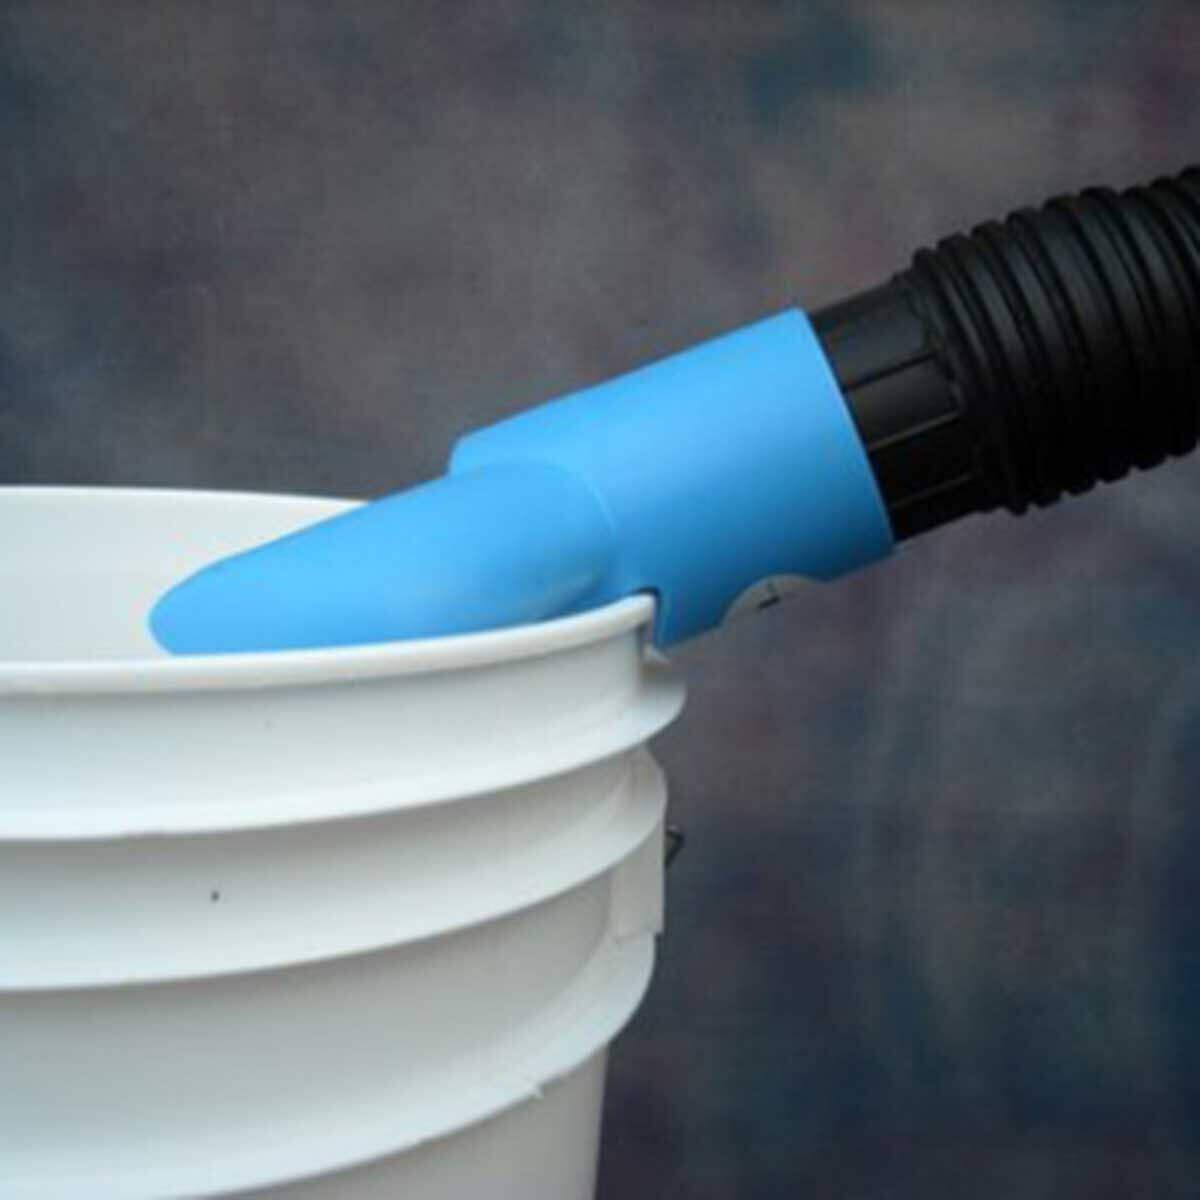 WaleTale Dust Control Vacuum Attachment, Use this vacuum hose attachment